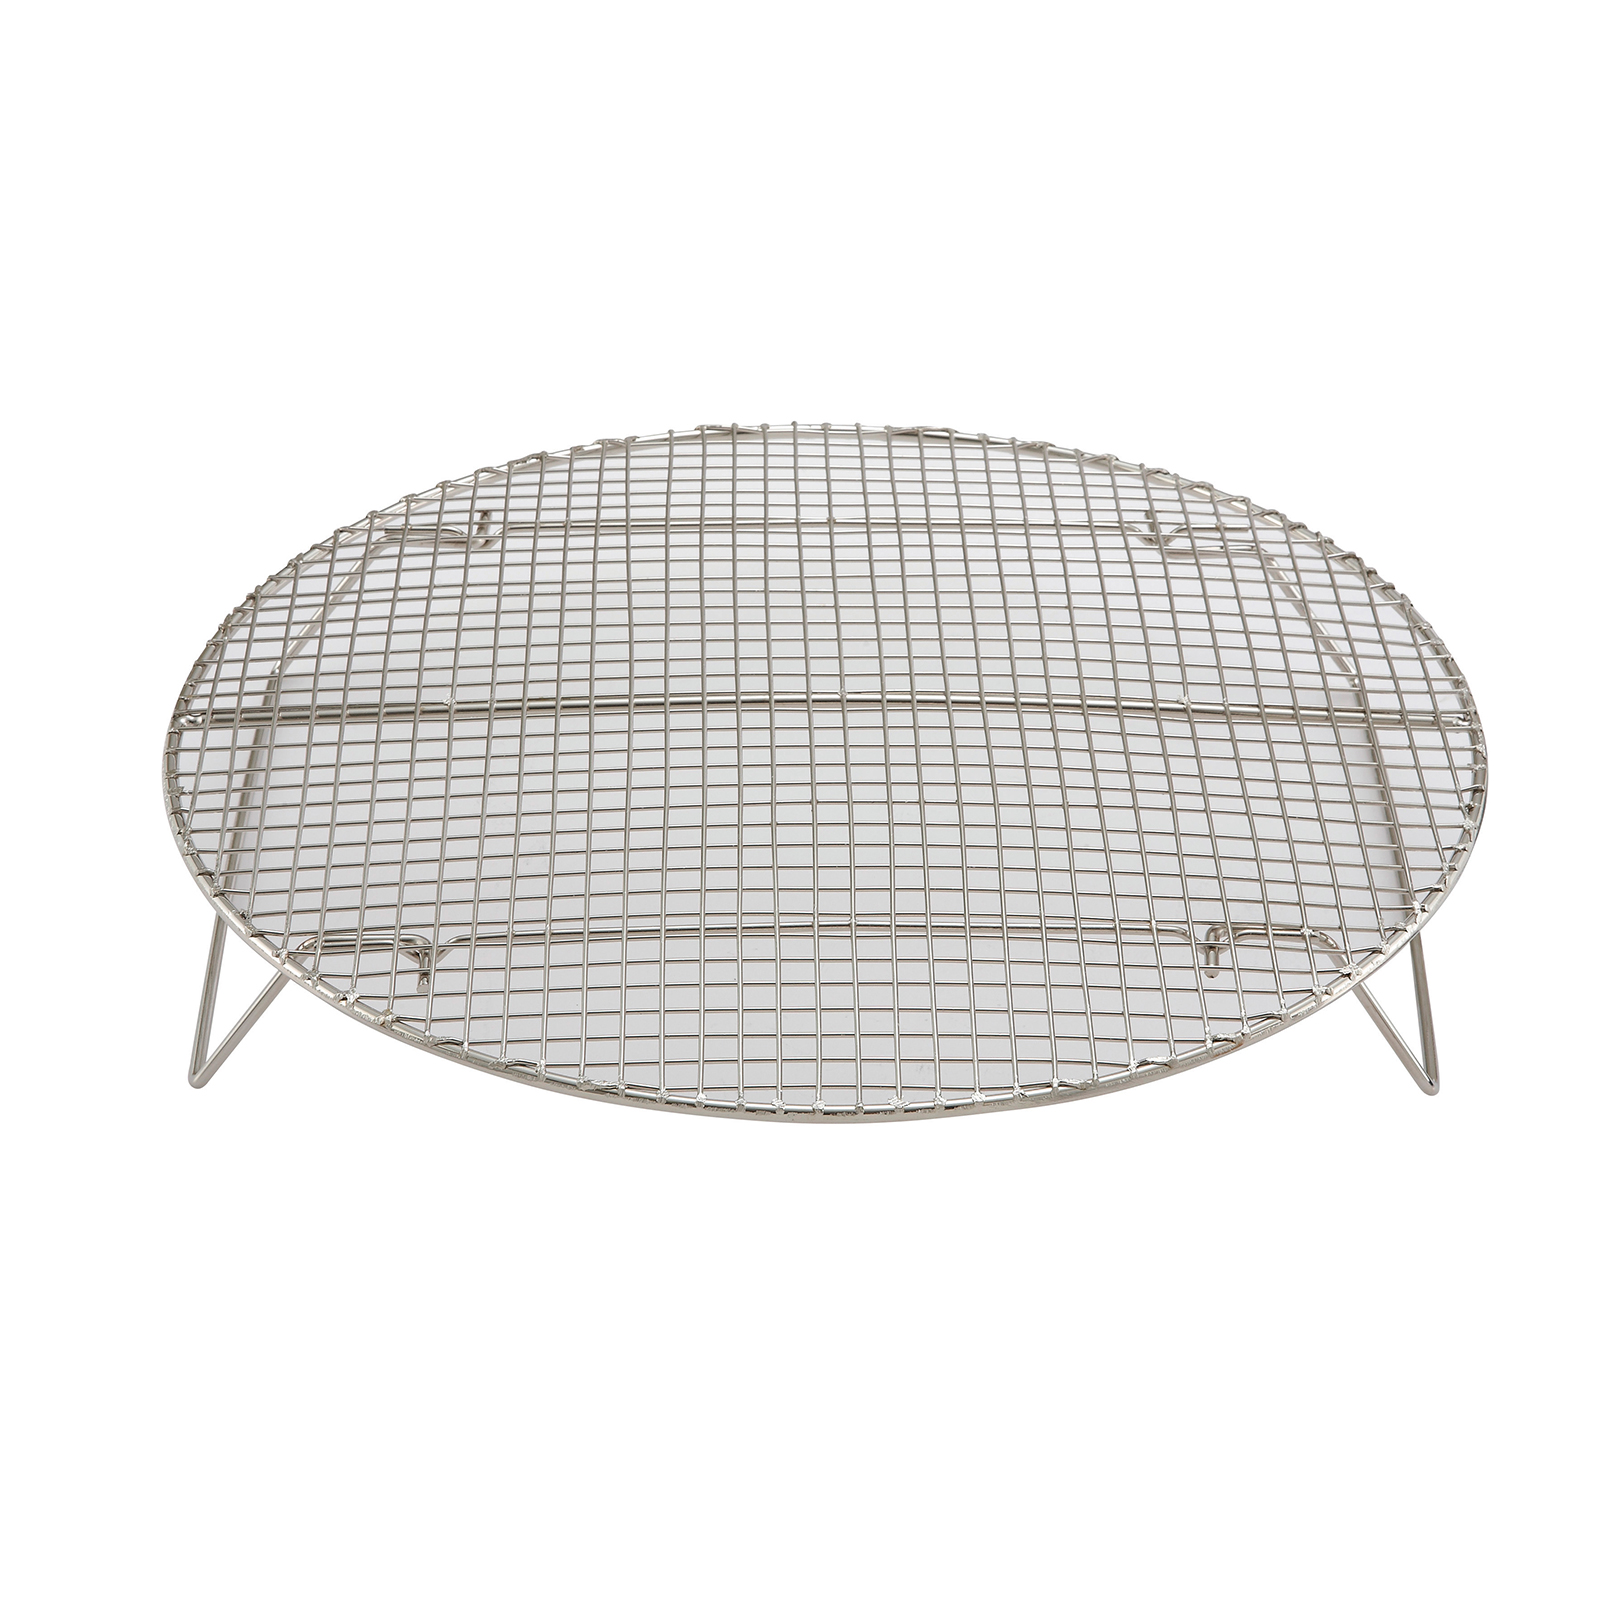 1000-35 Winco STR-15 wire pan rack / grate